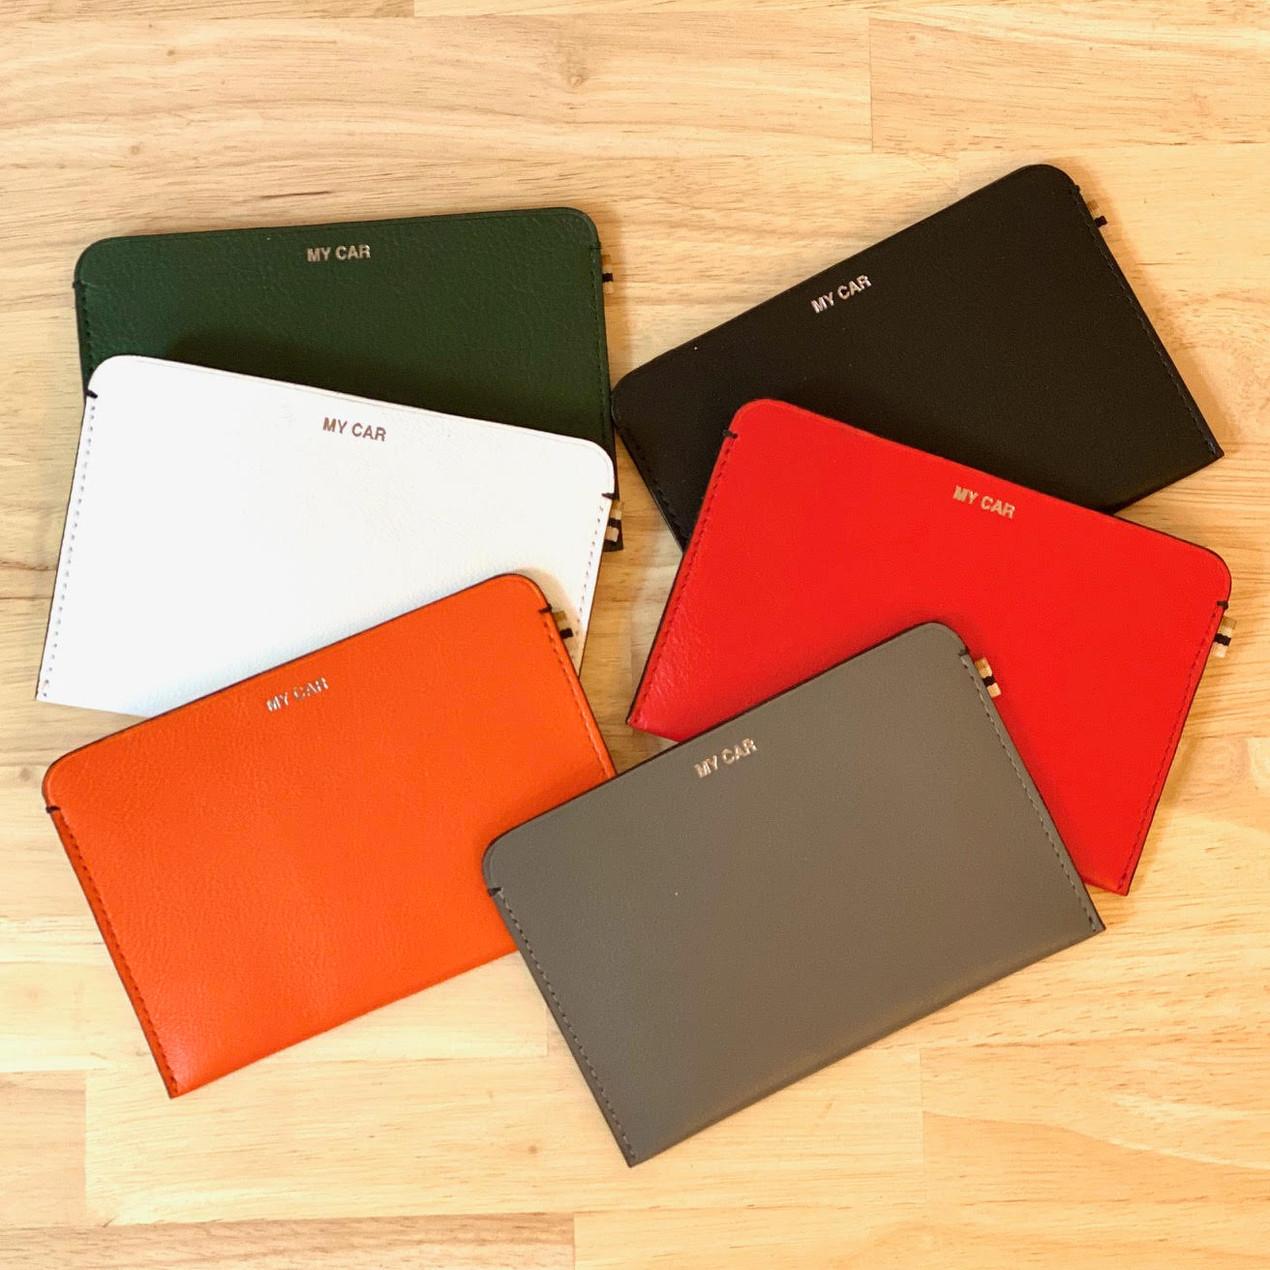 MY CAR - MLS-MarieLaurenceStevigny slim leather wallet in six colors